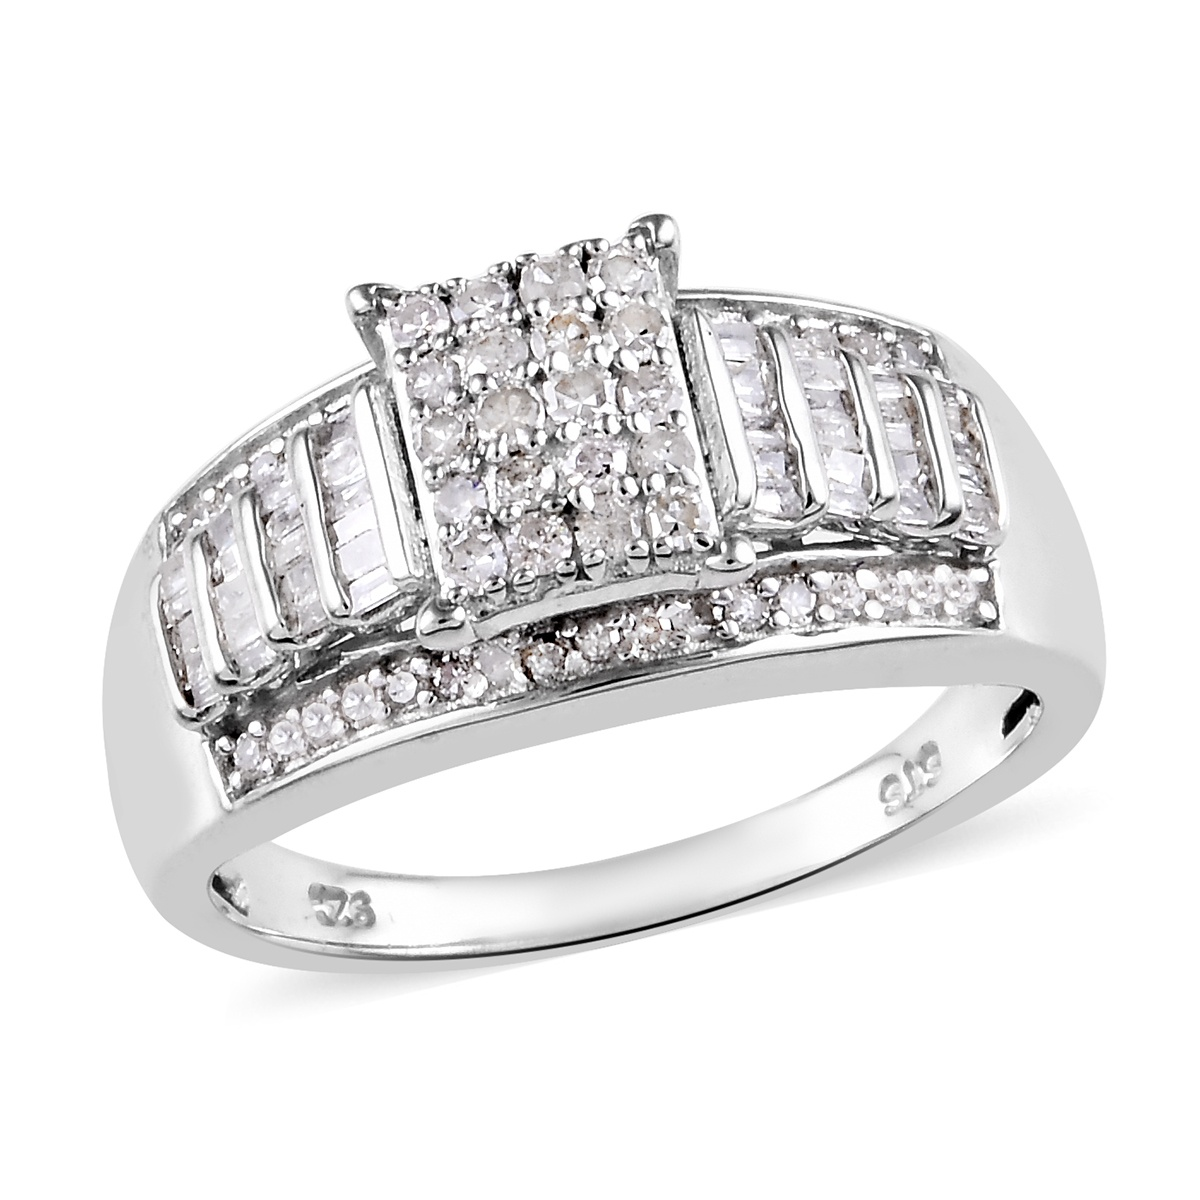 Loretta's Host Pick Diamond Ring in Platinum Over Sterling Silver (Size 5.0) 0.75 ctw